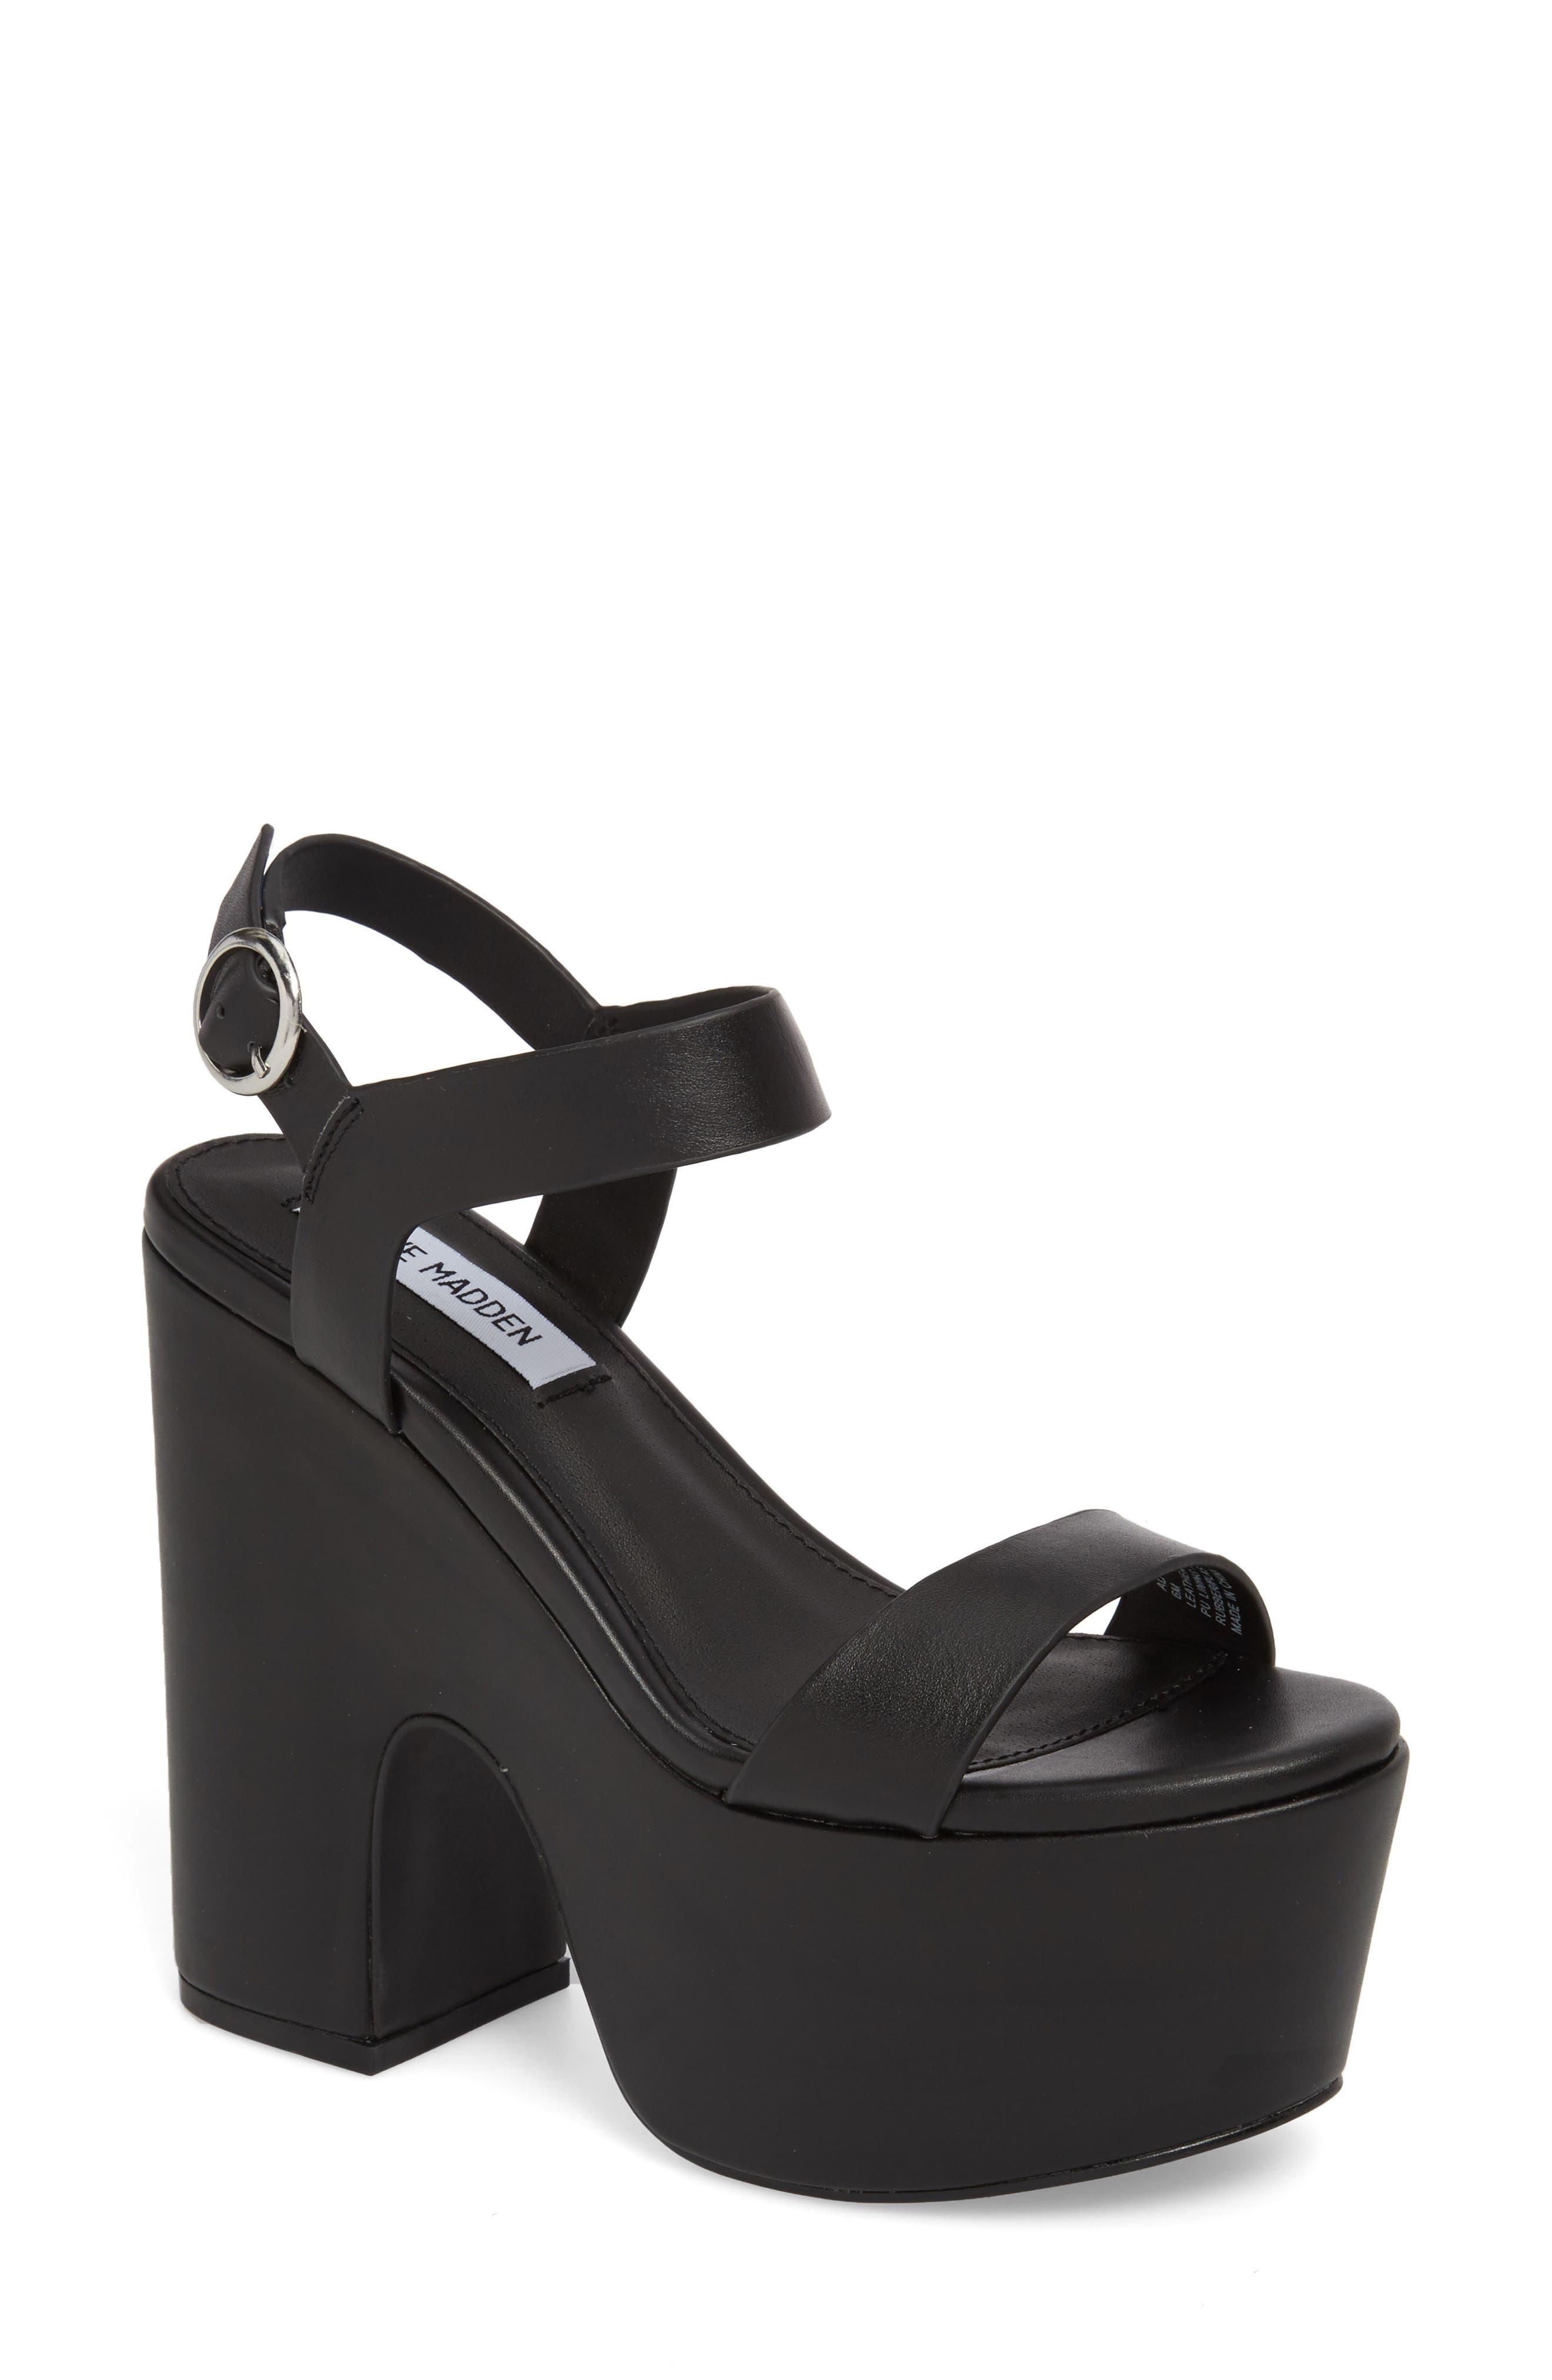 Advice Platform Sandal,                         Main,                         color, Black Leather